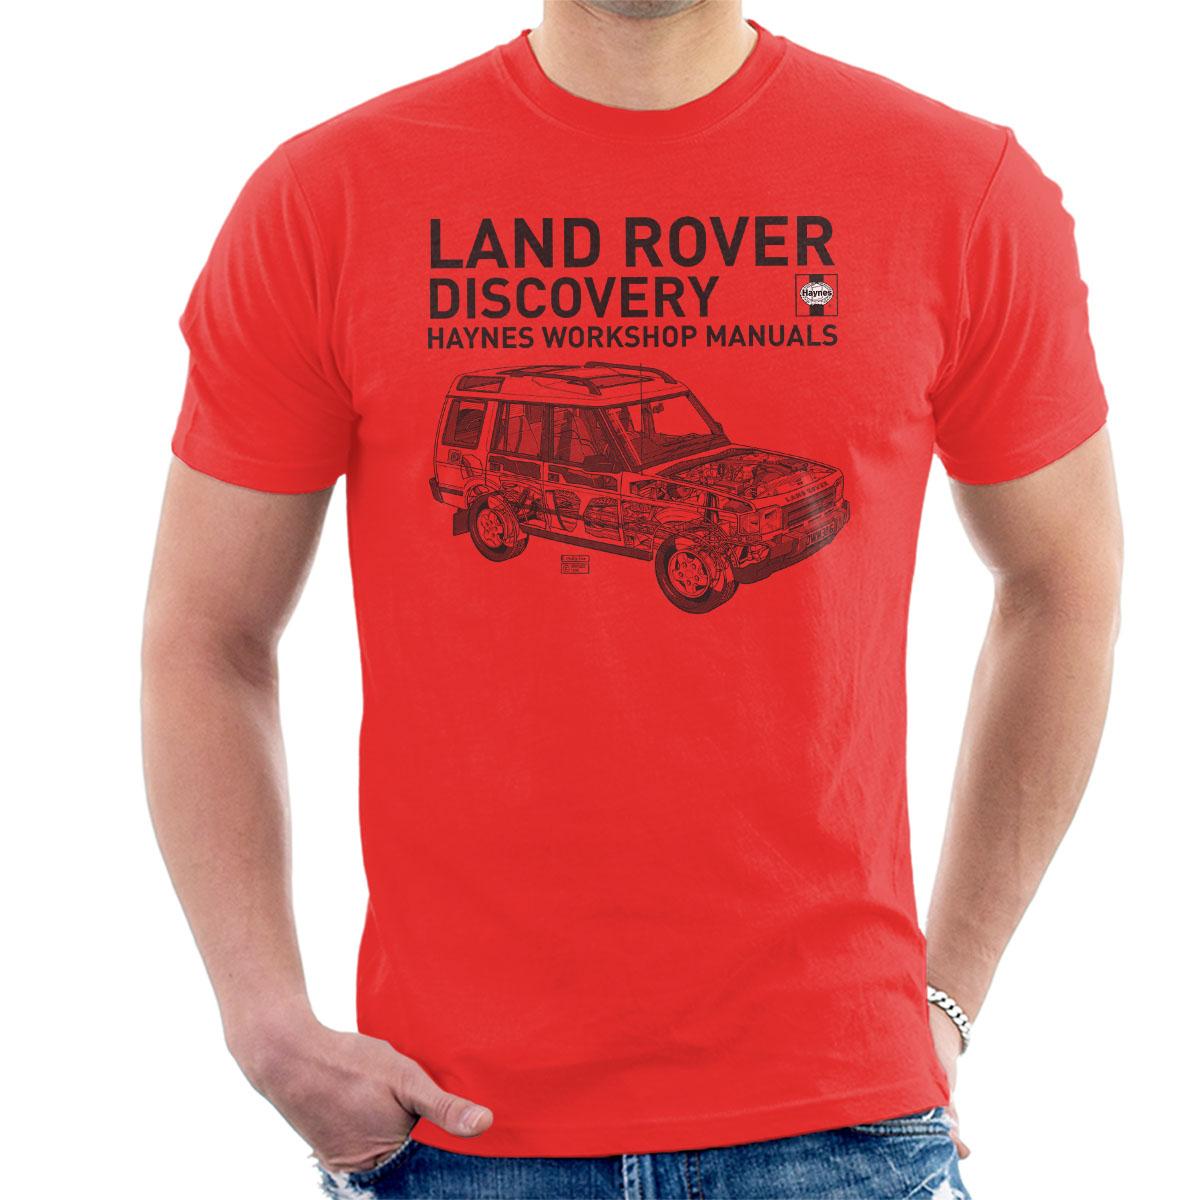 mens landrover shirt s shop shirts images logo zoom rover men land t